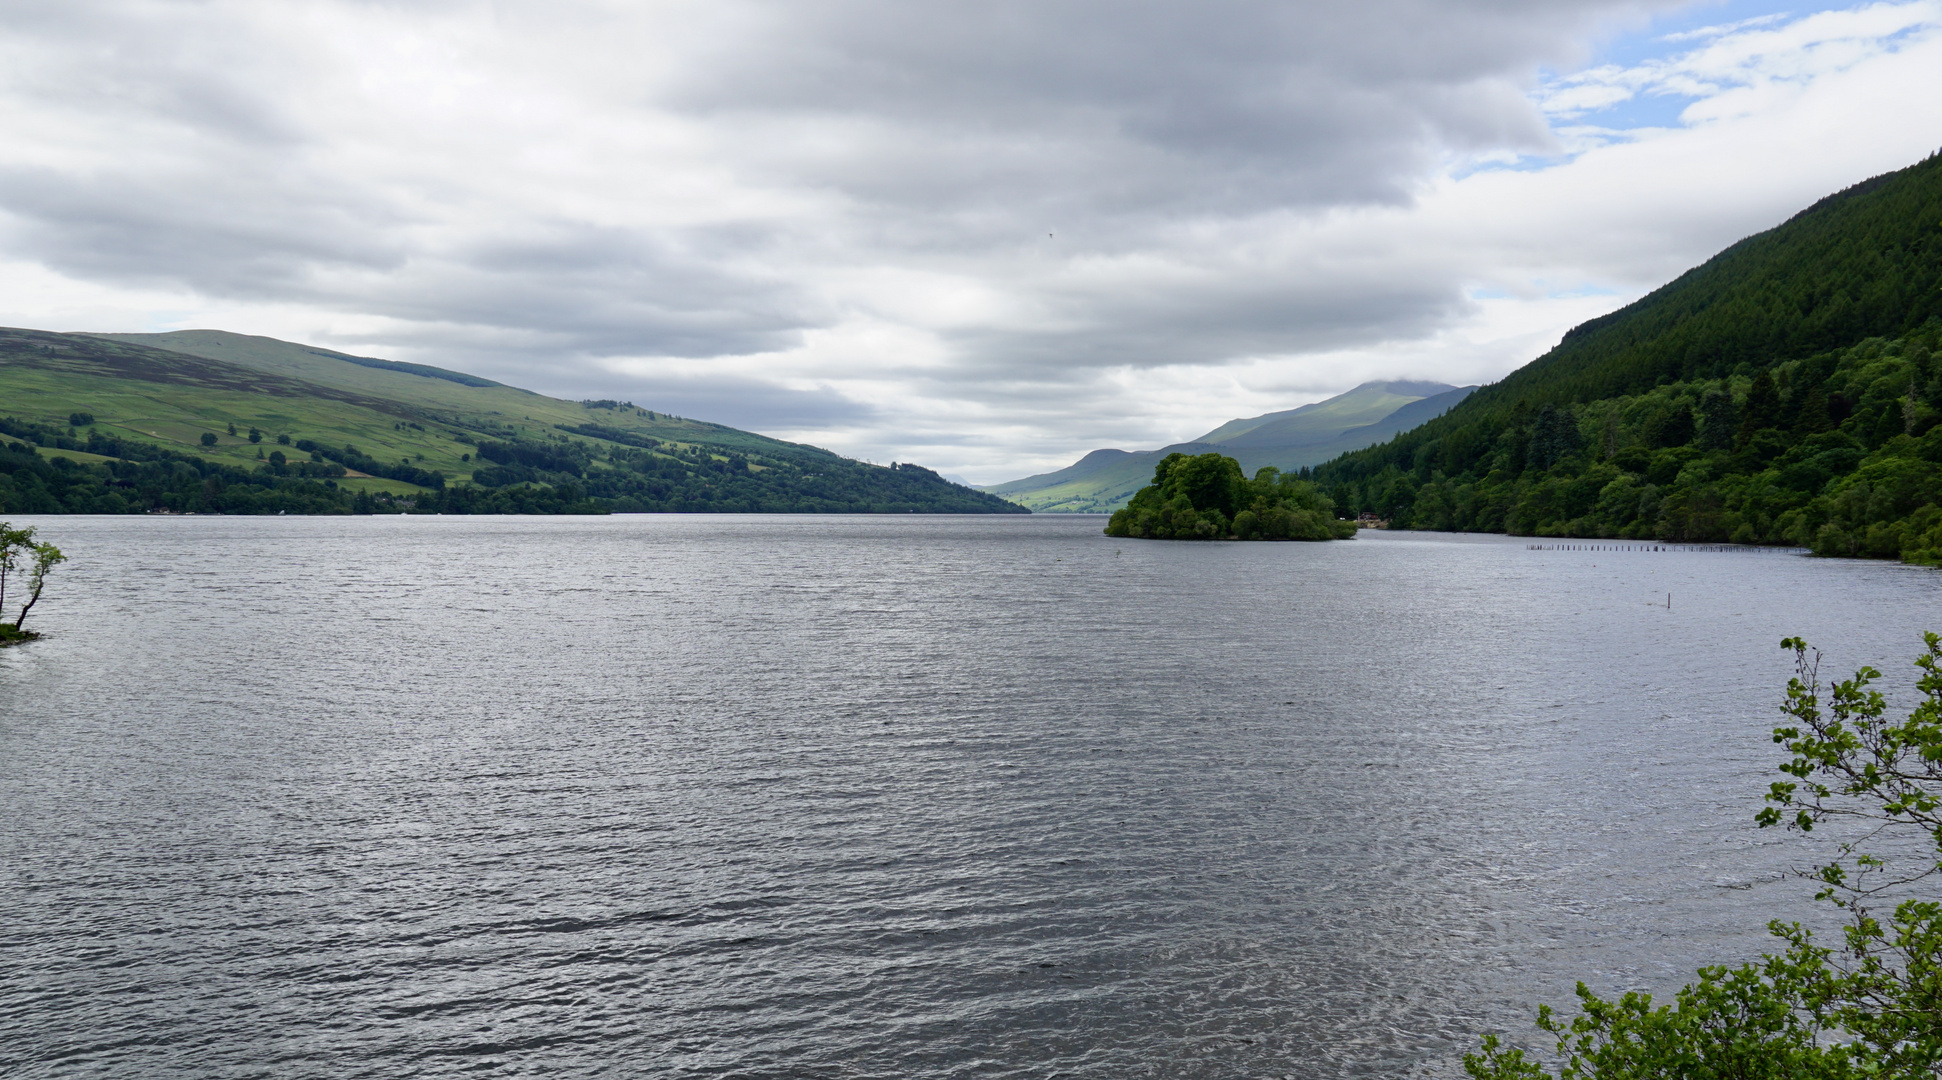 Loch Tay / Auch Schottland kann Grün